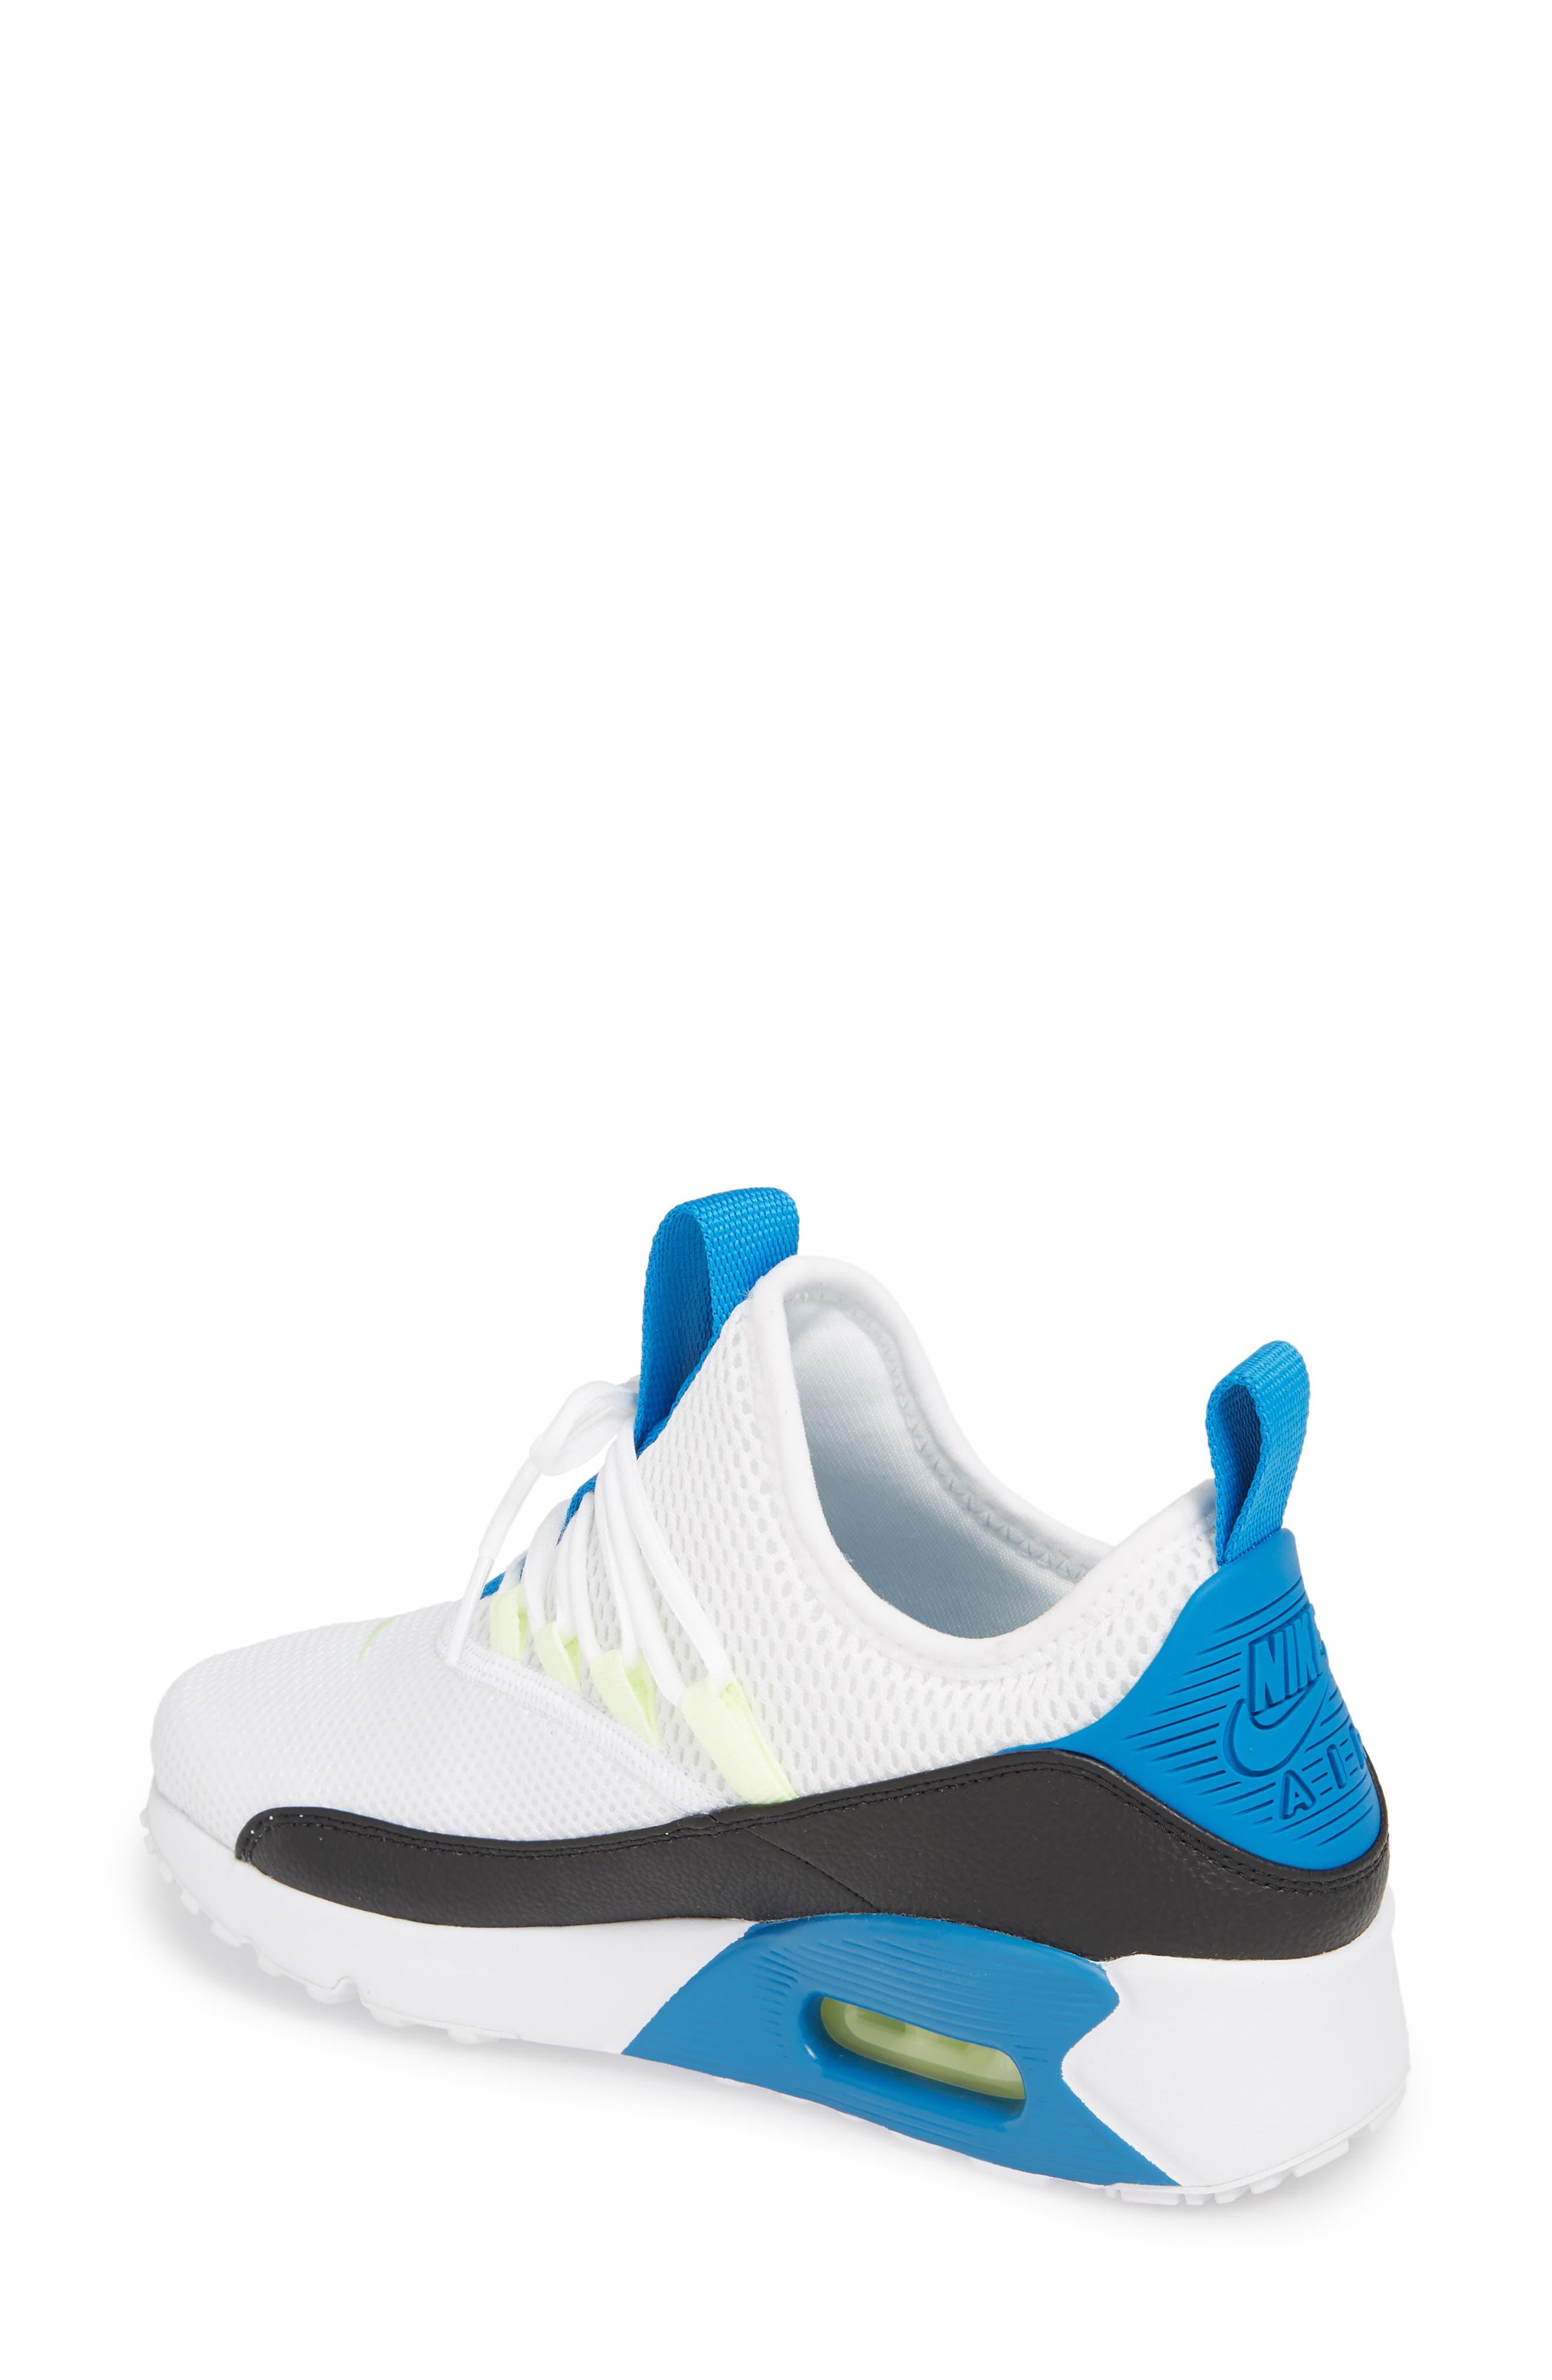 Air Max 90 EZ Sneaker,                             Alternate thumbnail 2, color,                             White/ Black/ Blue Nebula